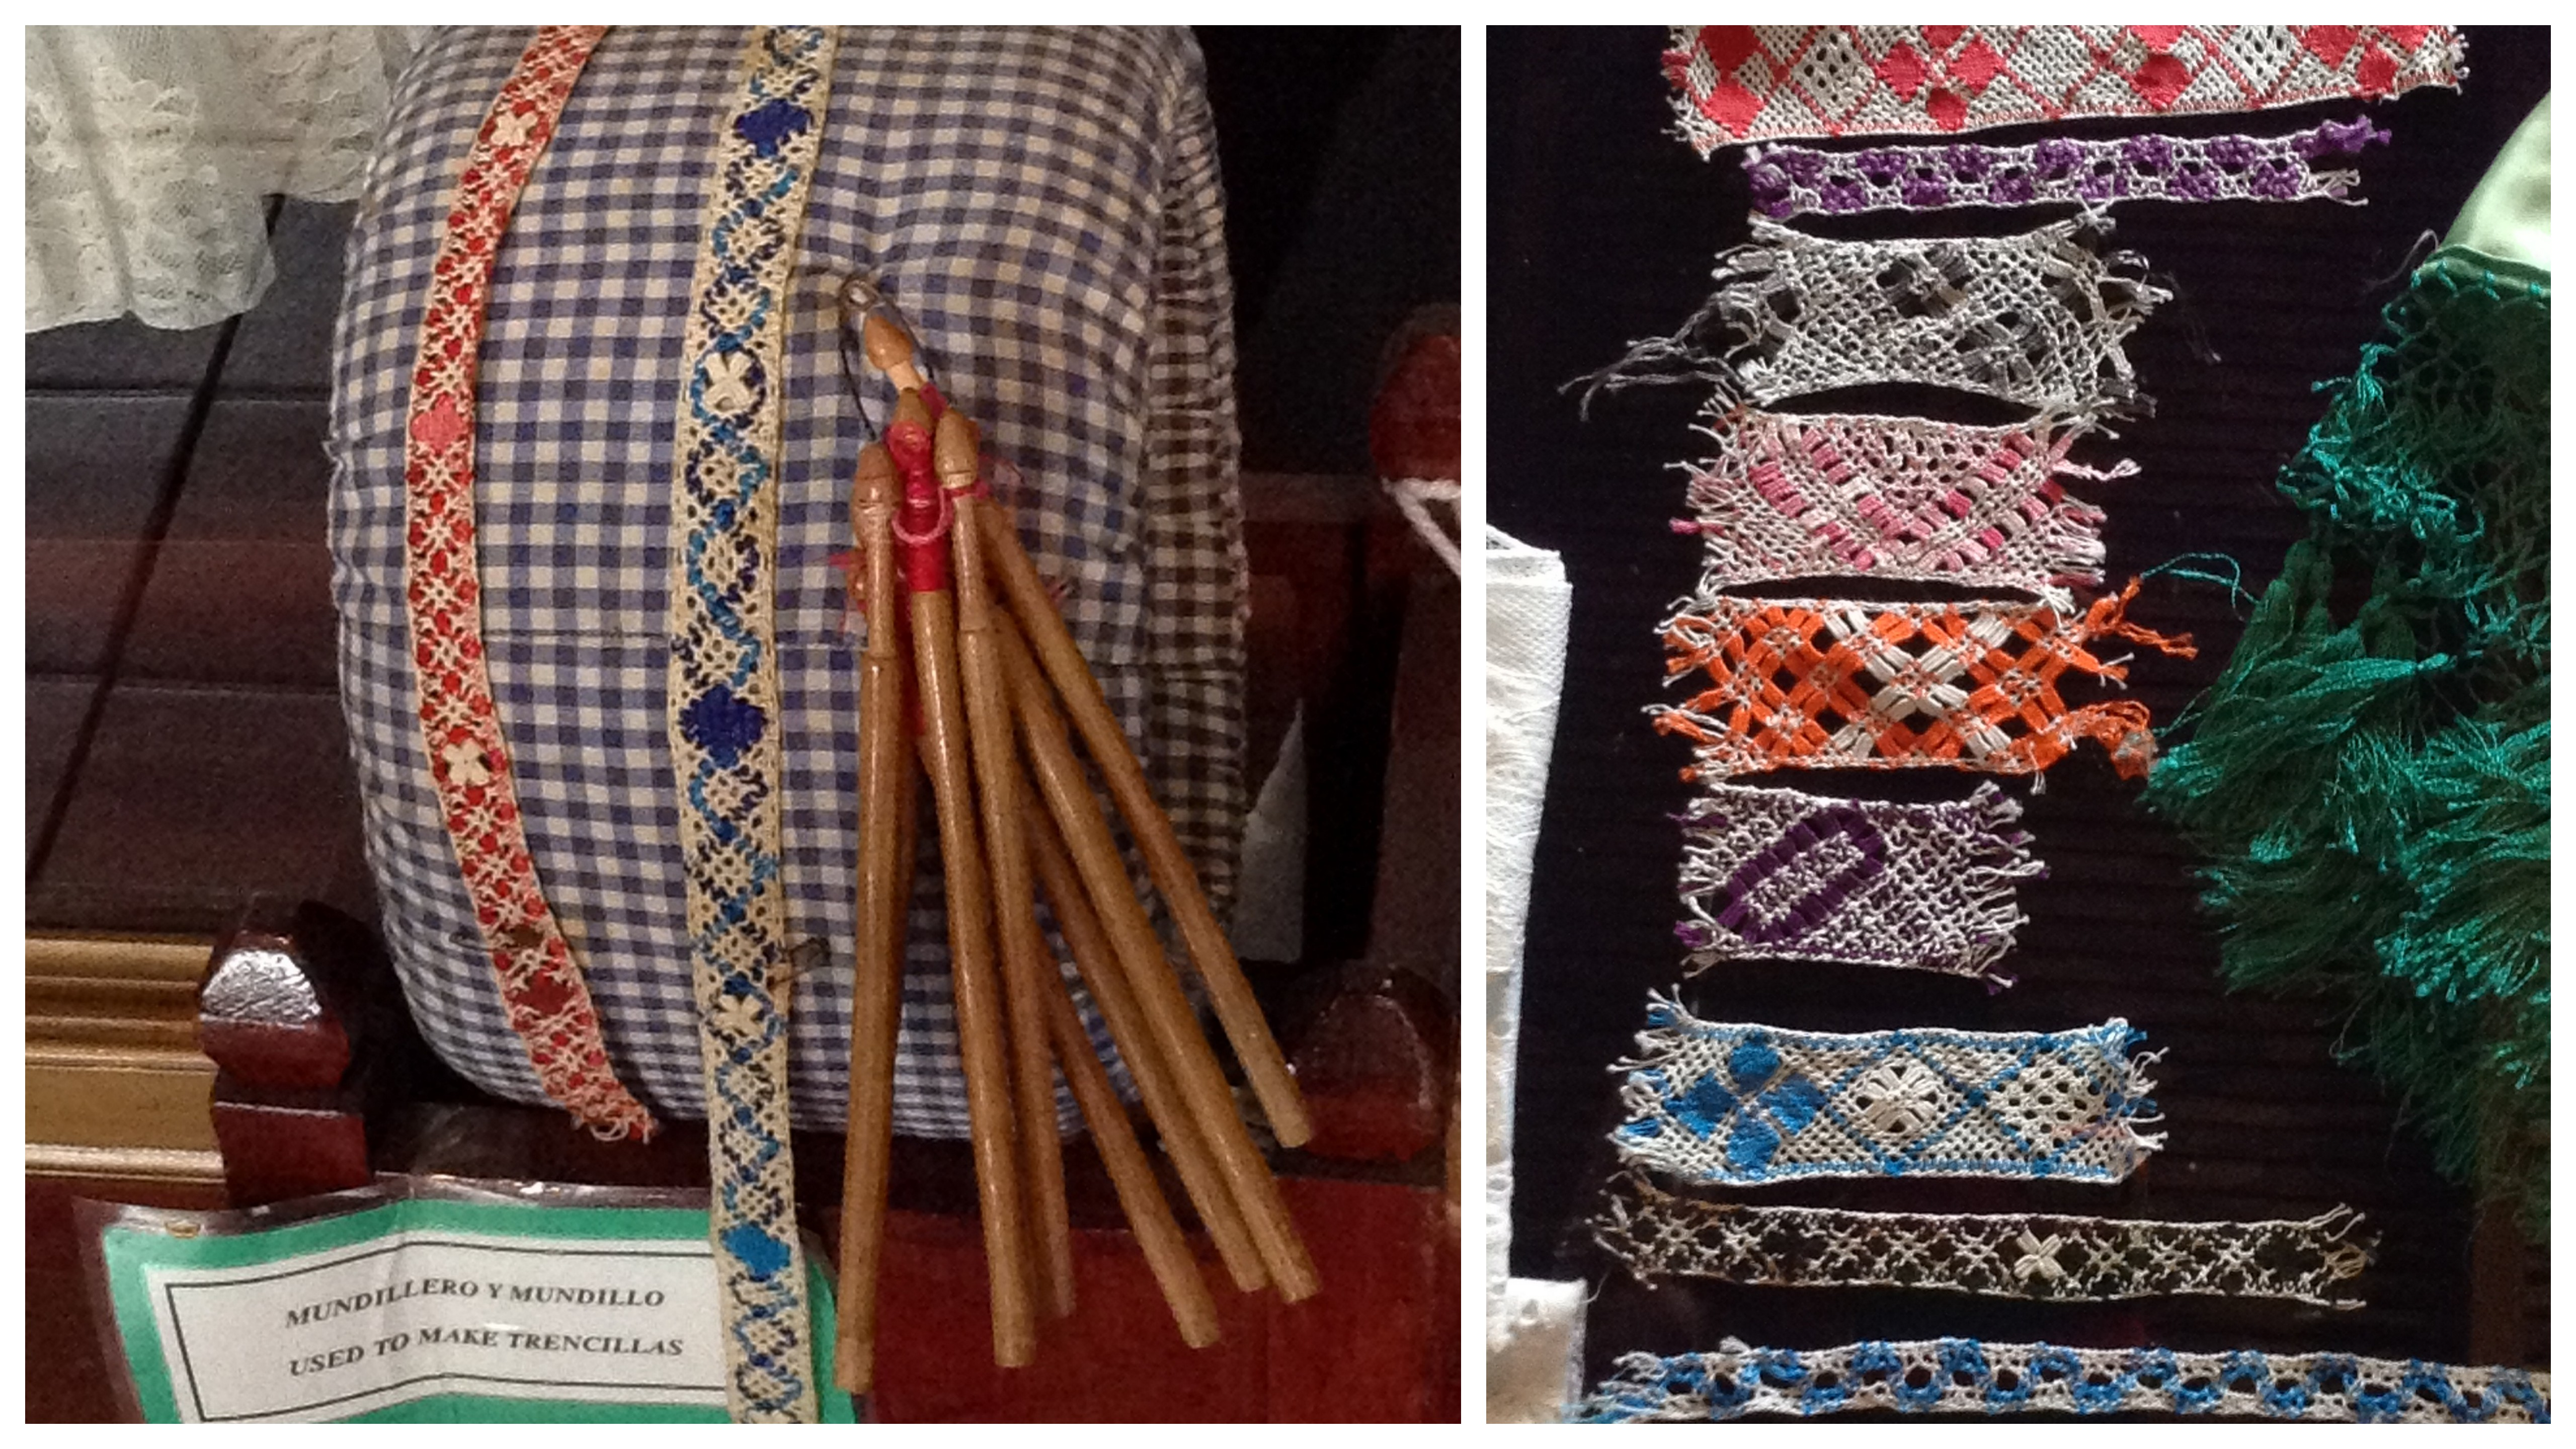 Panama - textiles at La Pueblita ANCONA1